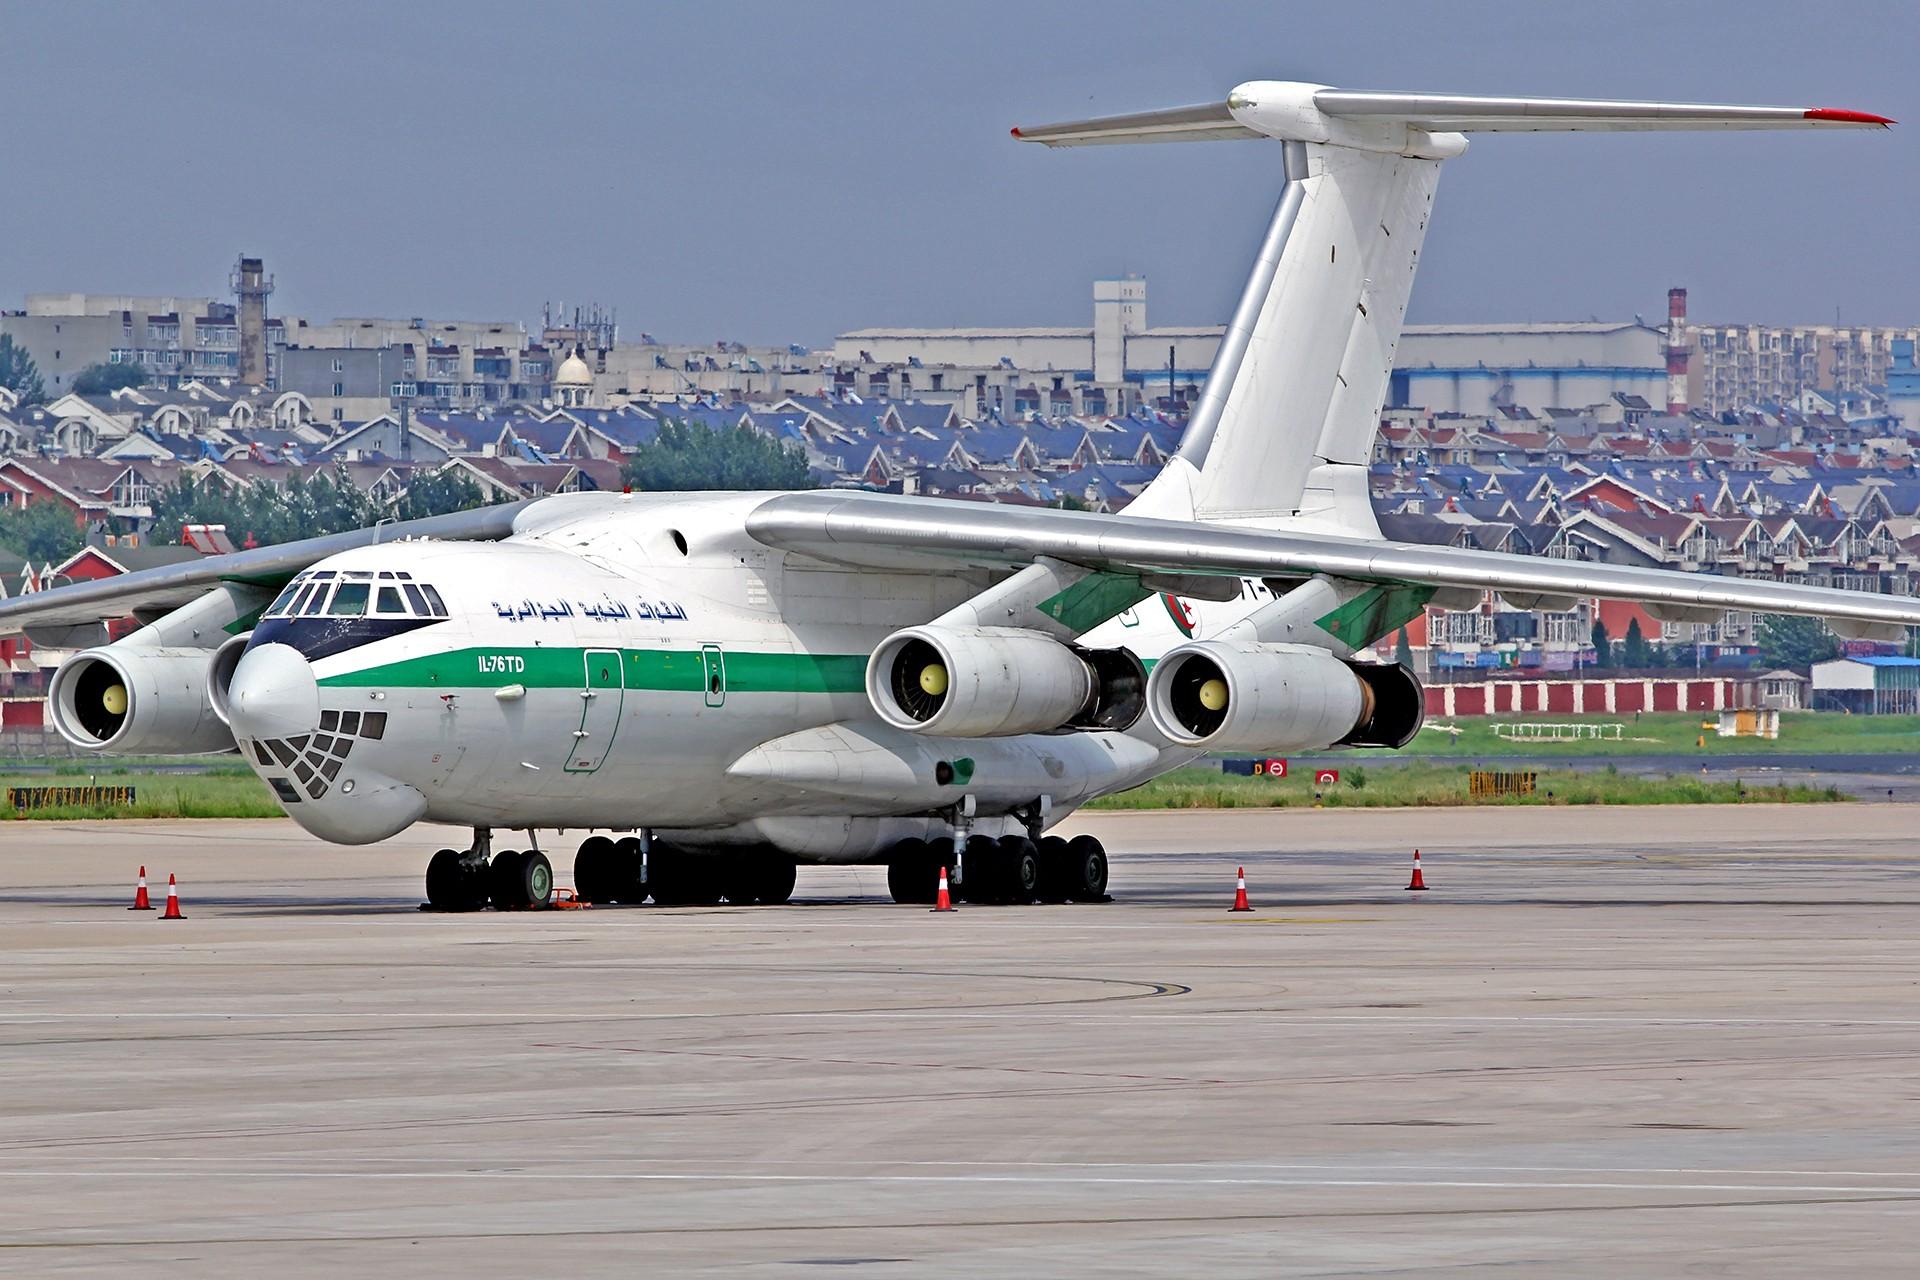 Re:[原创][DLC]... 阿尔及利亚空军 IL-76TD…璀璨星昼夜 ILYUSHIN IL-76-TD 7T-WIE 中国大连周水子国际机场